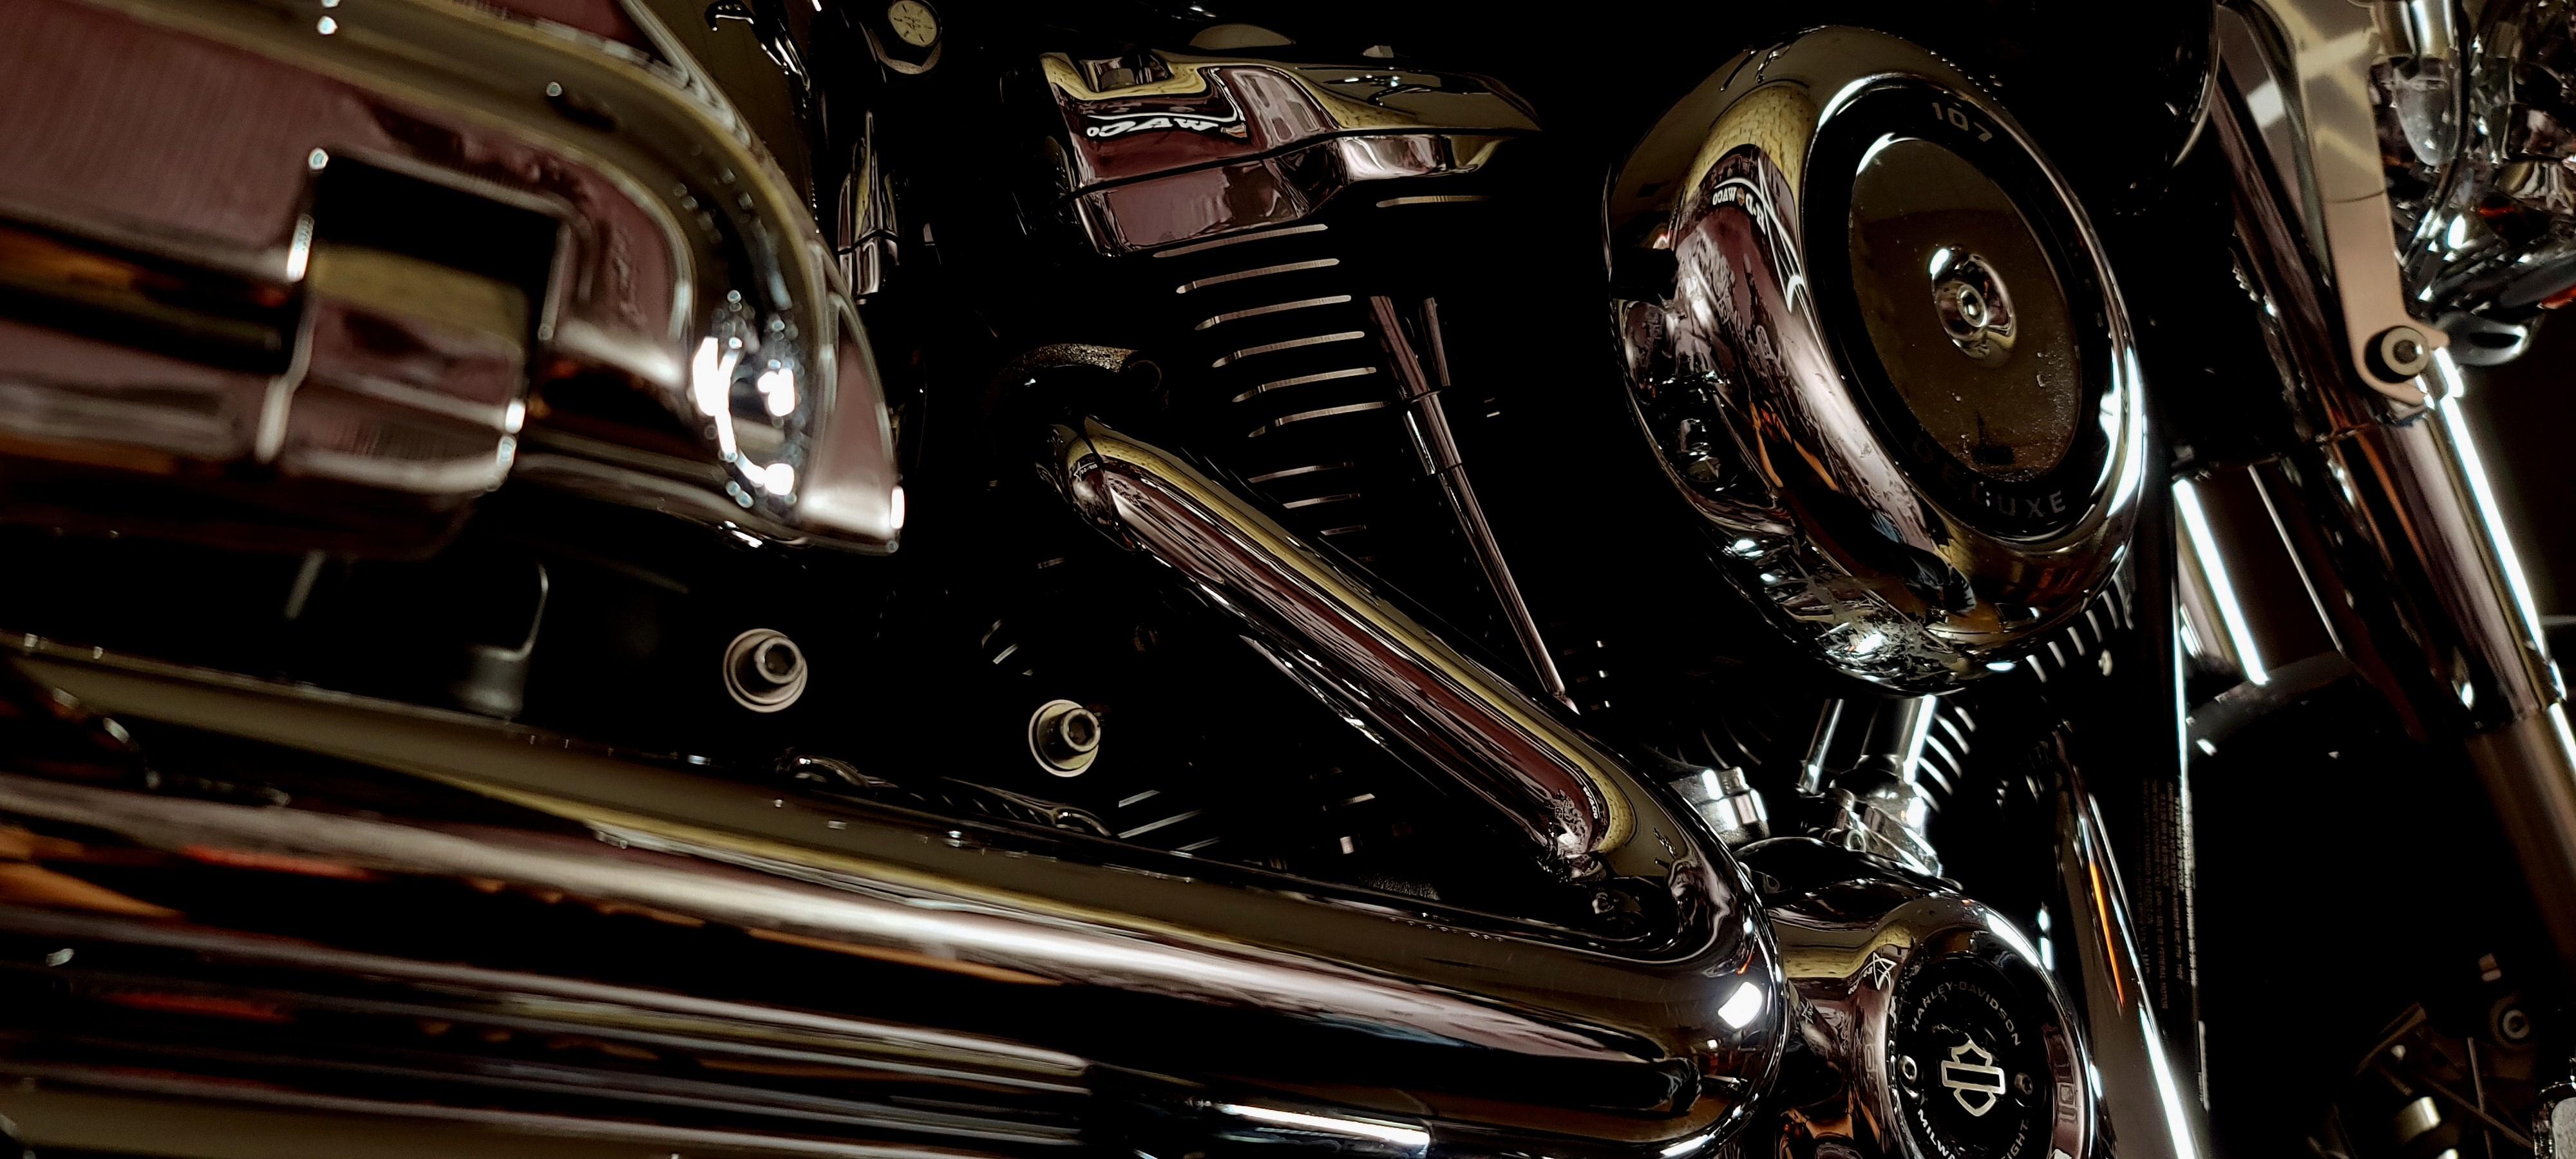 2019 Harley-Davidson Softail Deluxe at Harley-Davidson of Waco